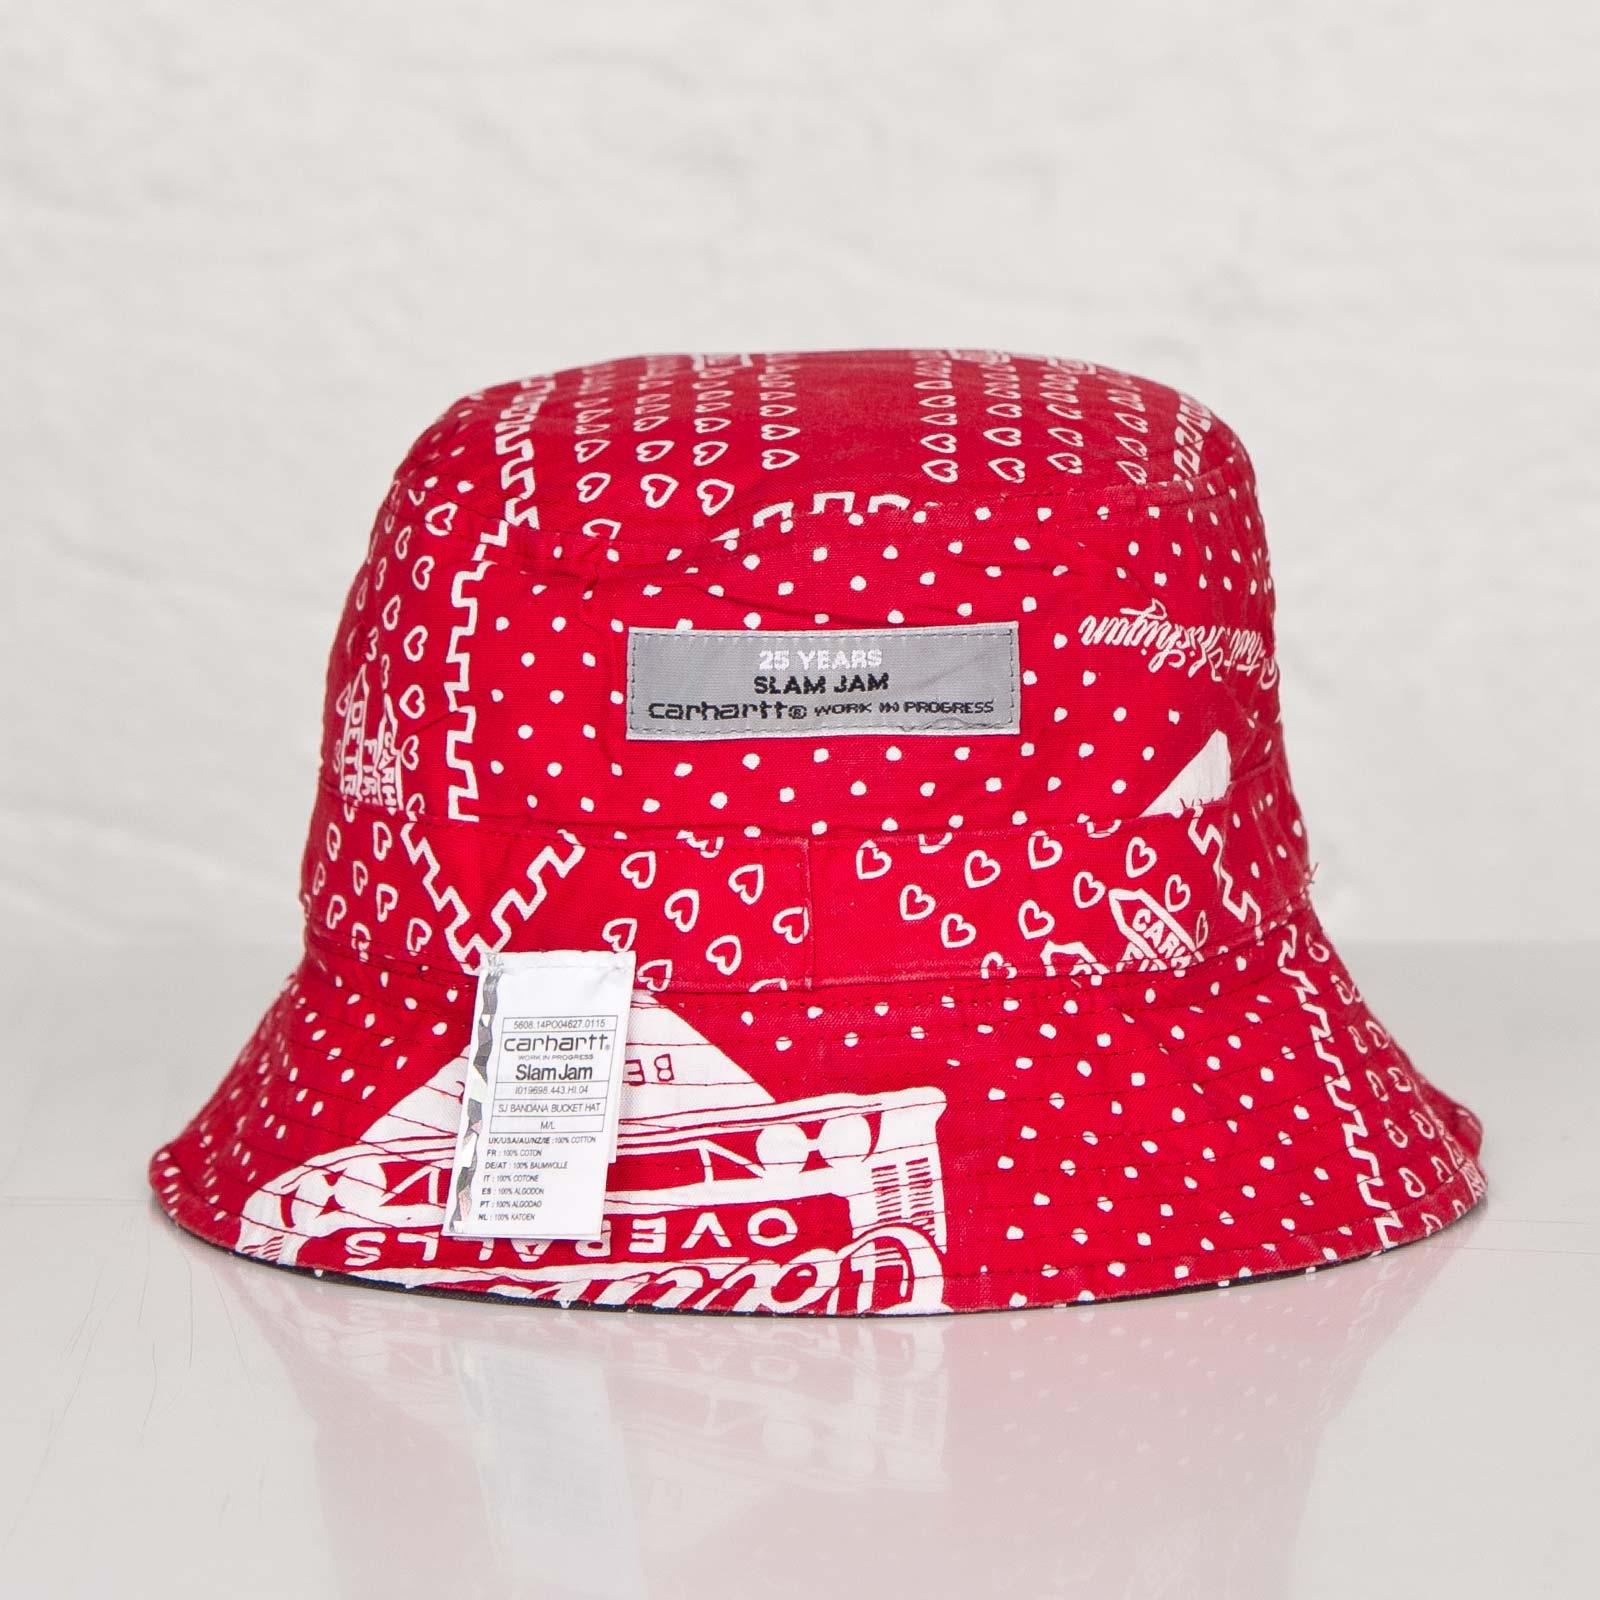 c83e883f57c low price nike bucket hat 52b6c d18c2  netherlands carhartt wip sj bandana bucket  hat 512d7 5a40b